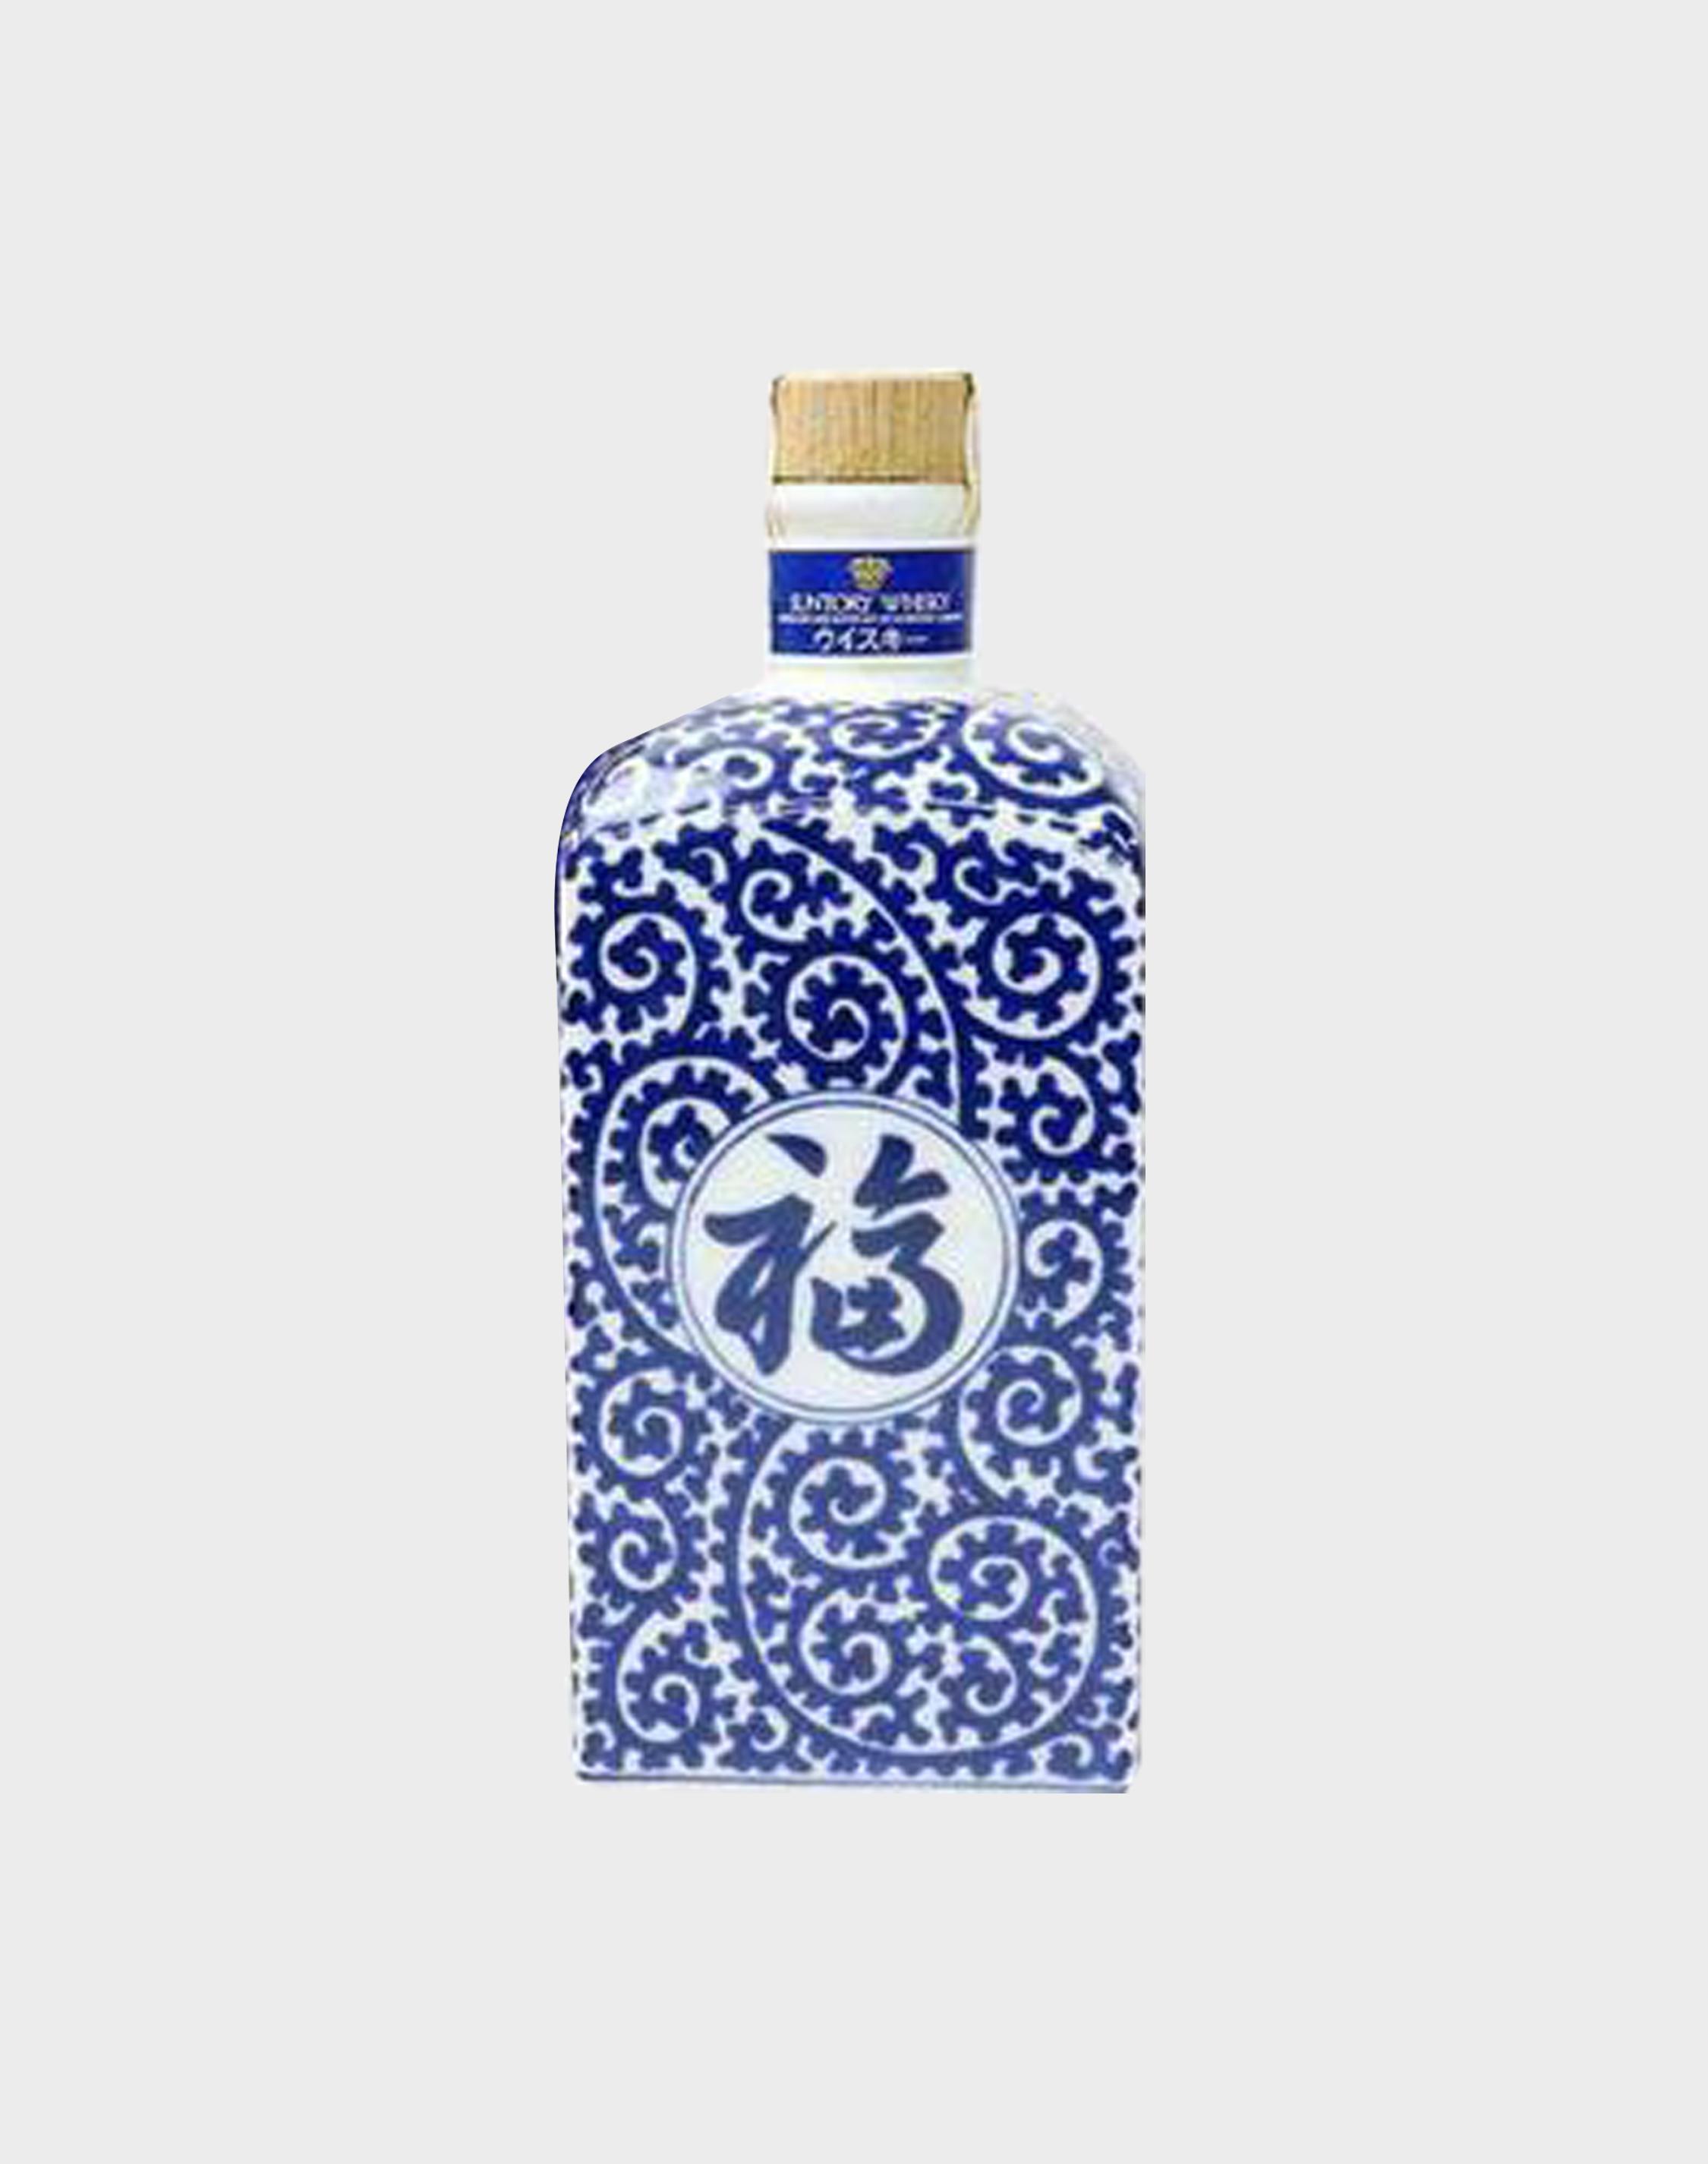 Suntory Pure Malt Whisky Yamazaki Arita-yaki 'HUKU' (Nobox)